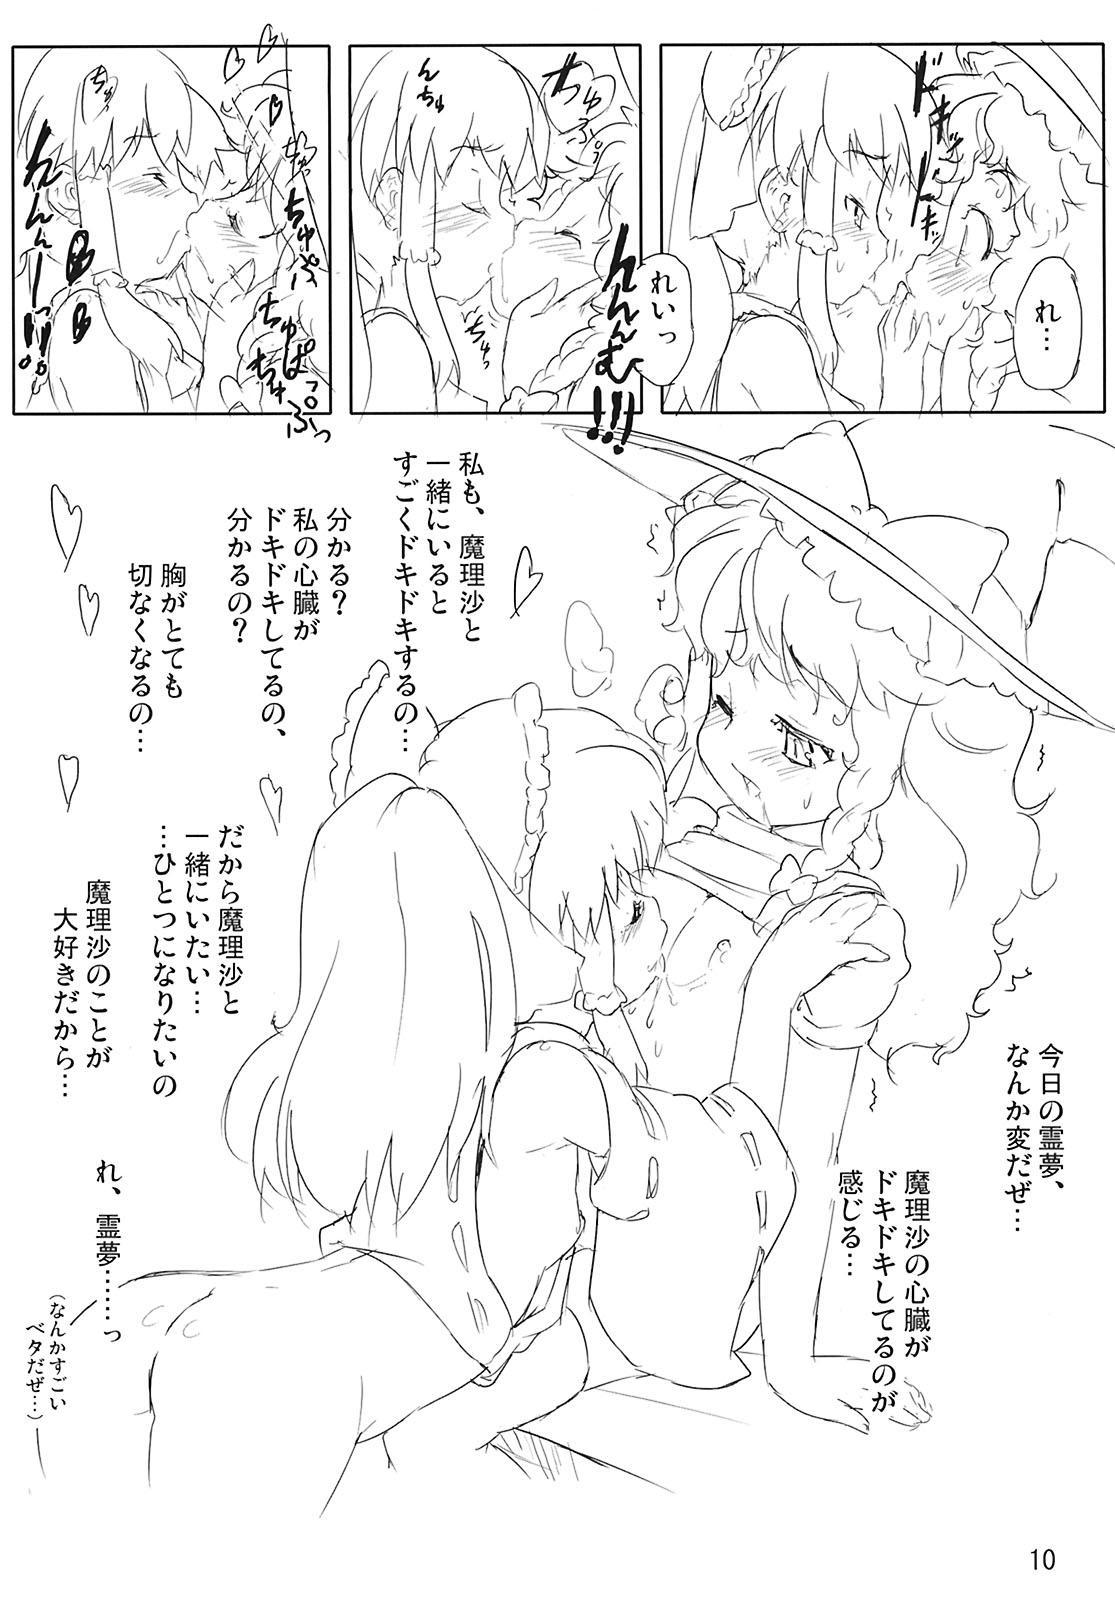 Kirisame Kinoko Jiken - cream of mushroom soup 9